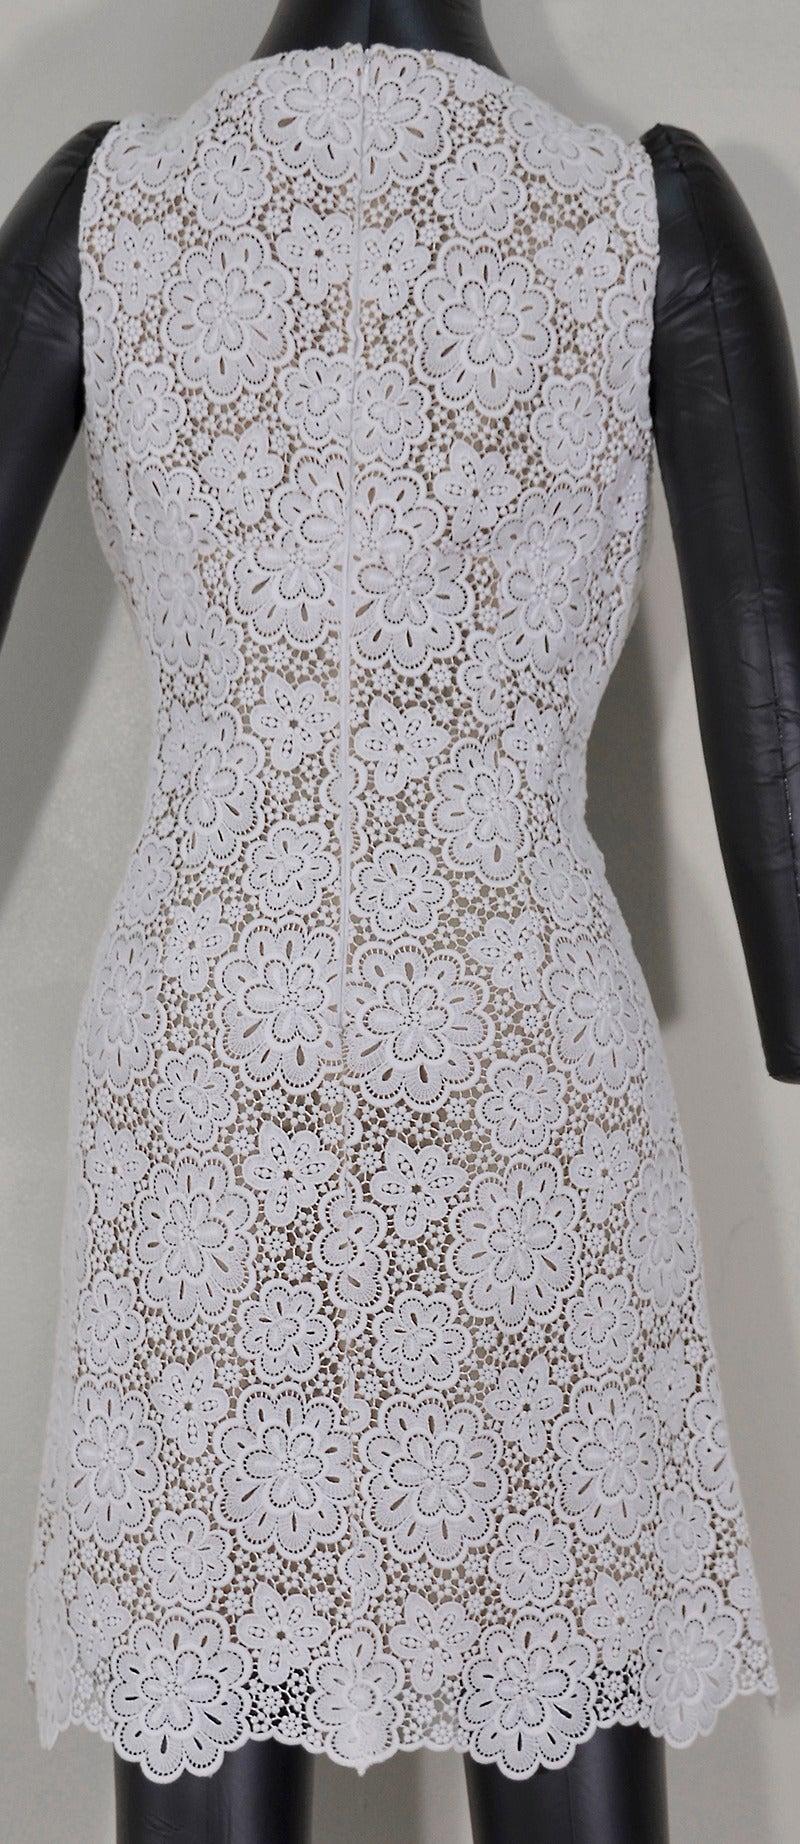 Gray Beautiful Michael Kors Lace Dress For Sale